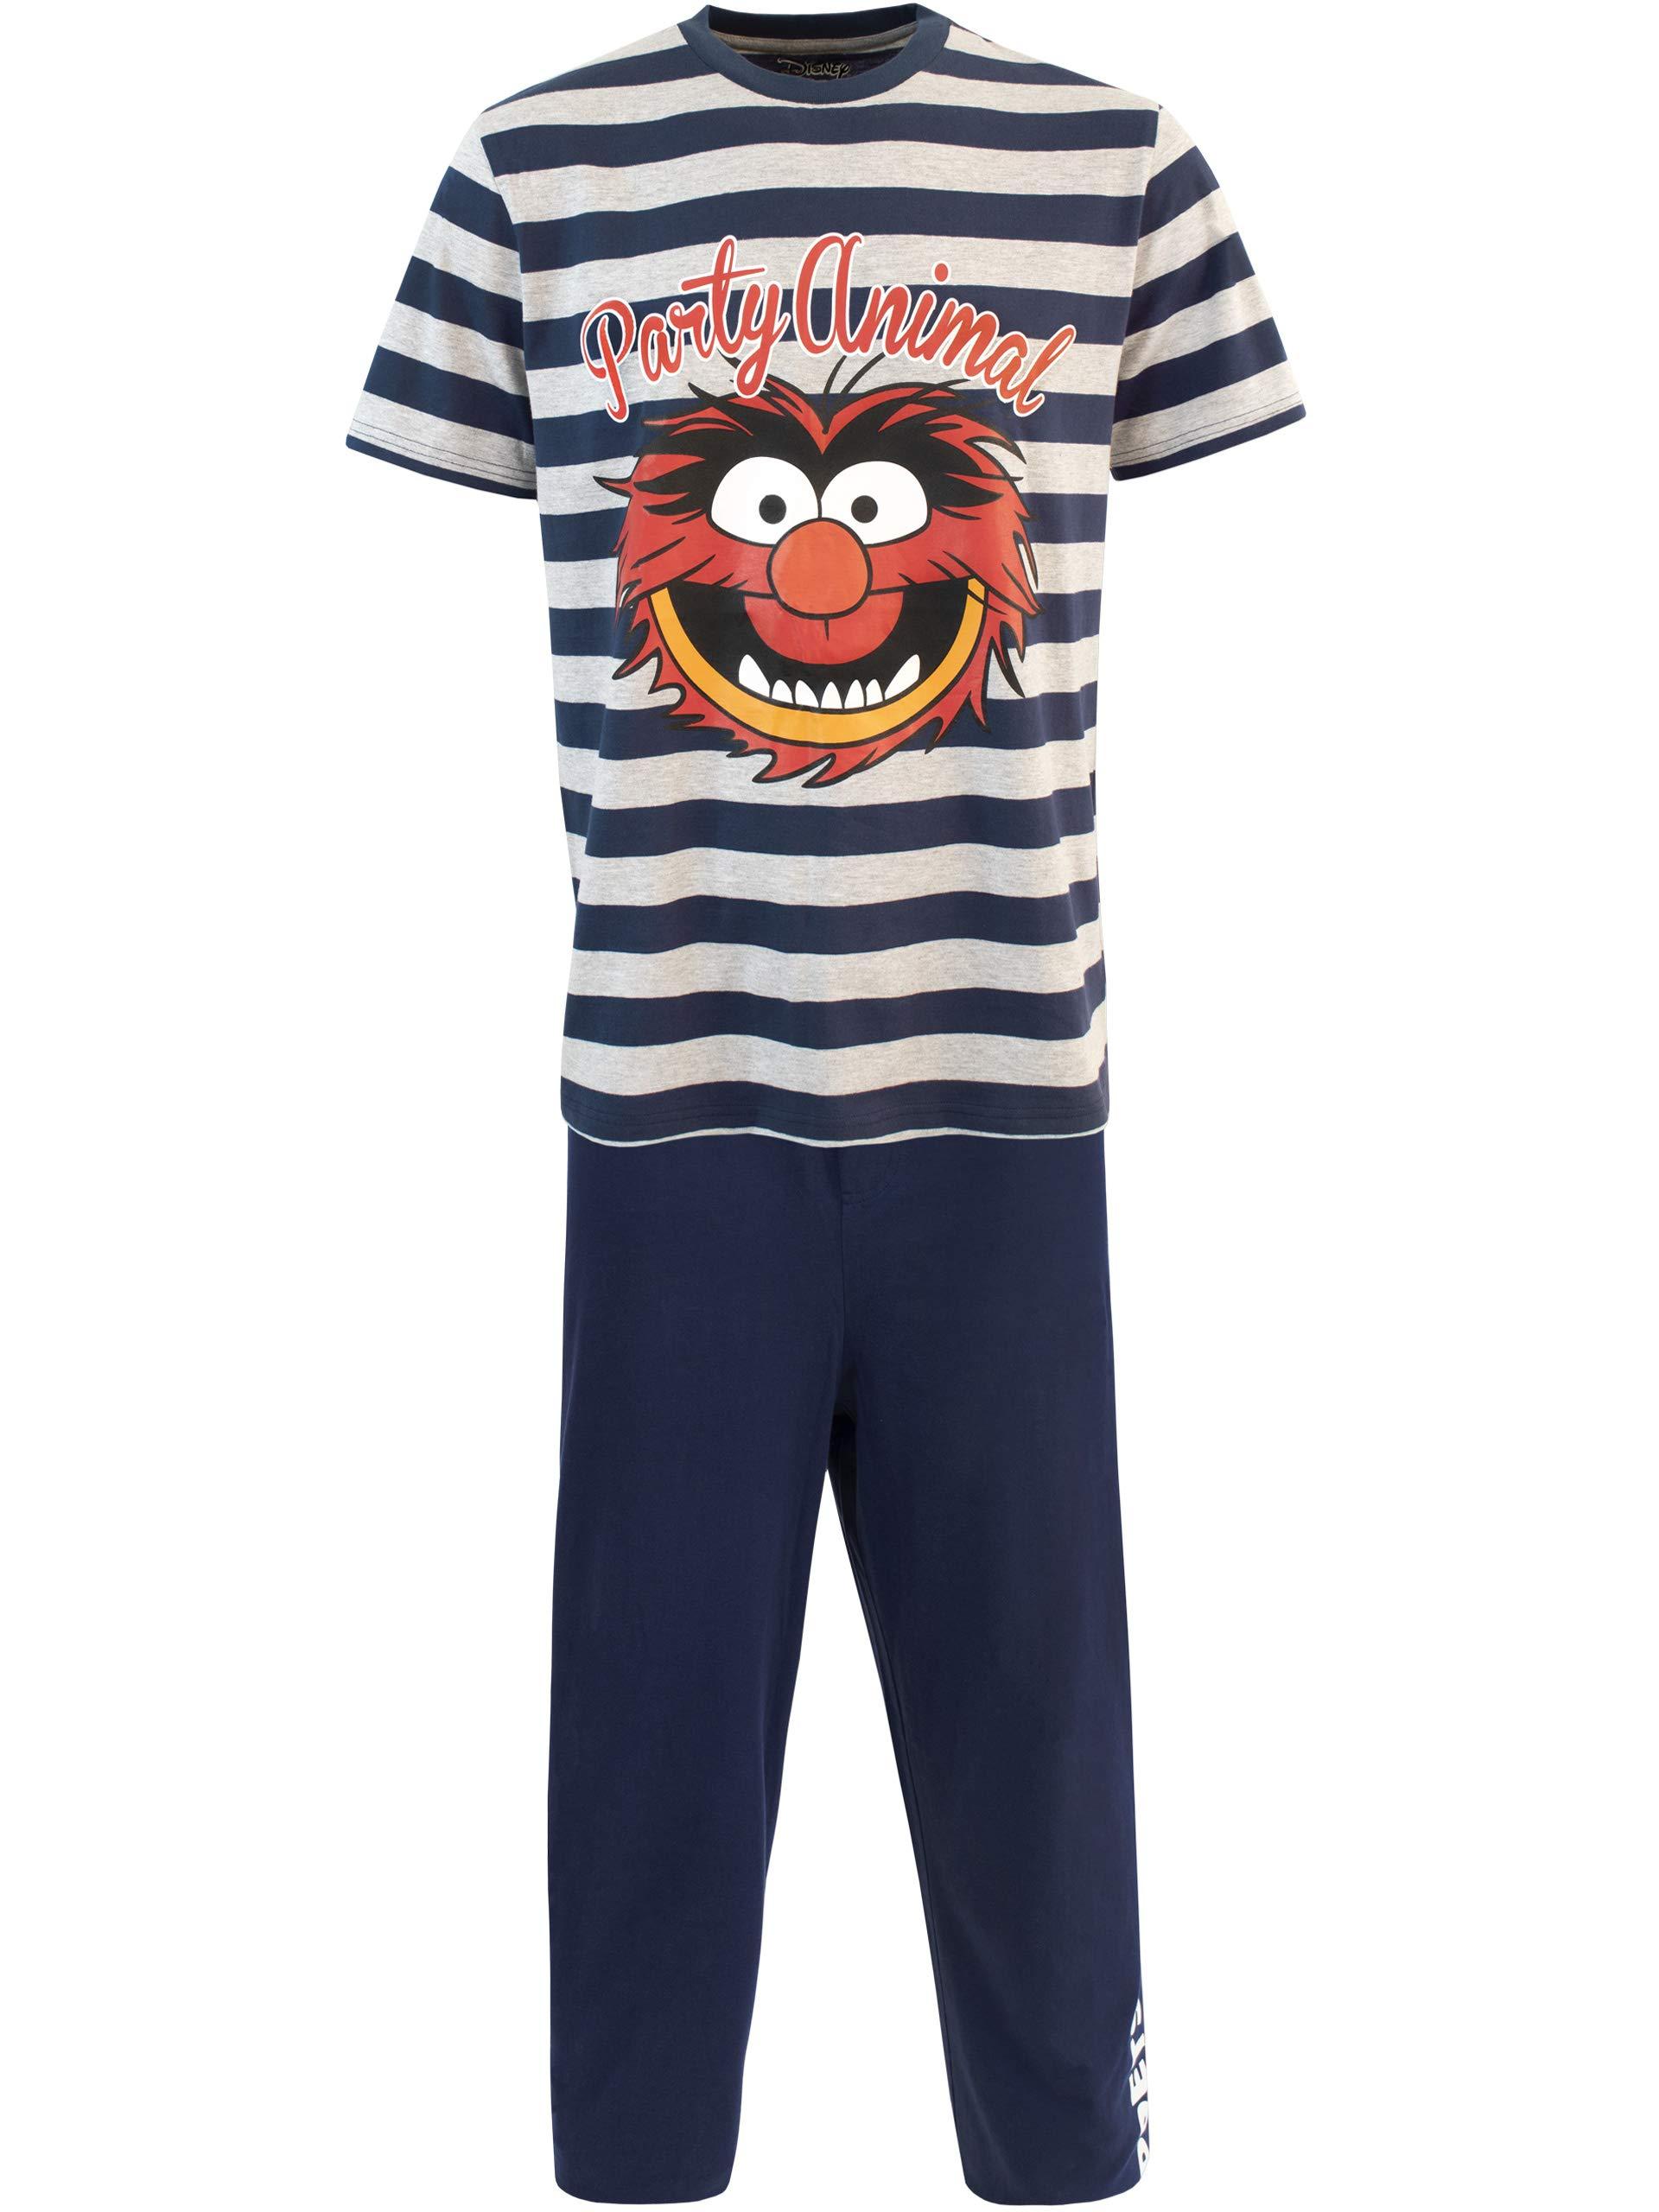 Mens Muppets Animal Pyjamas Disney Various Designs